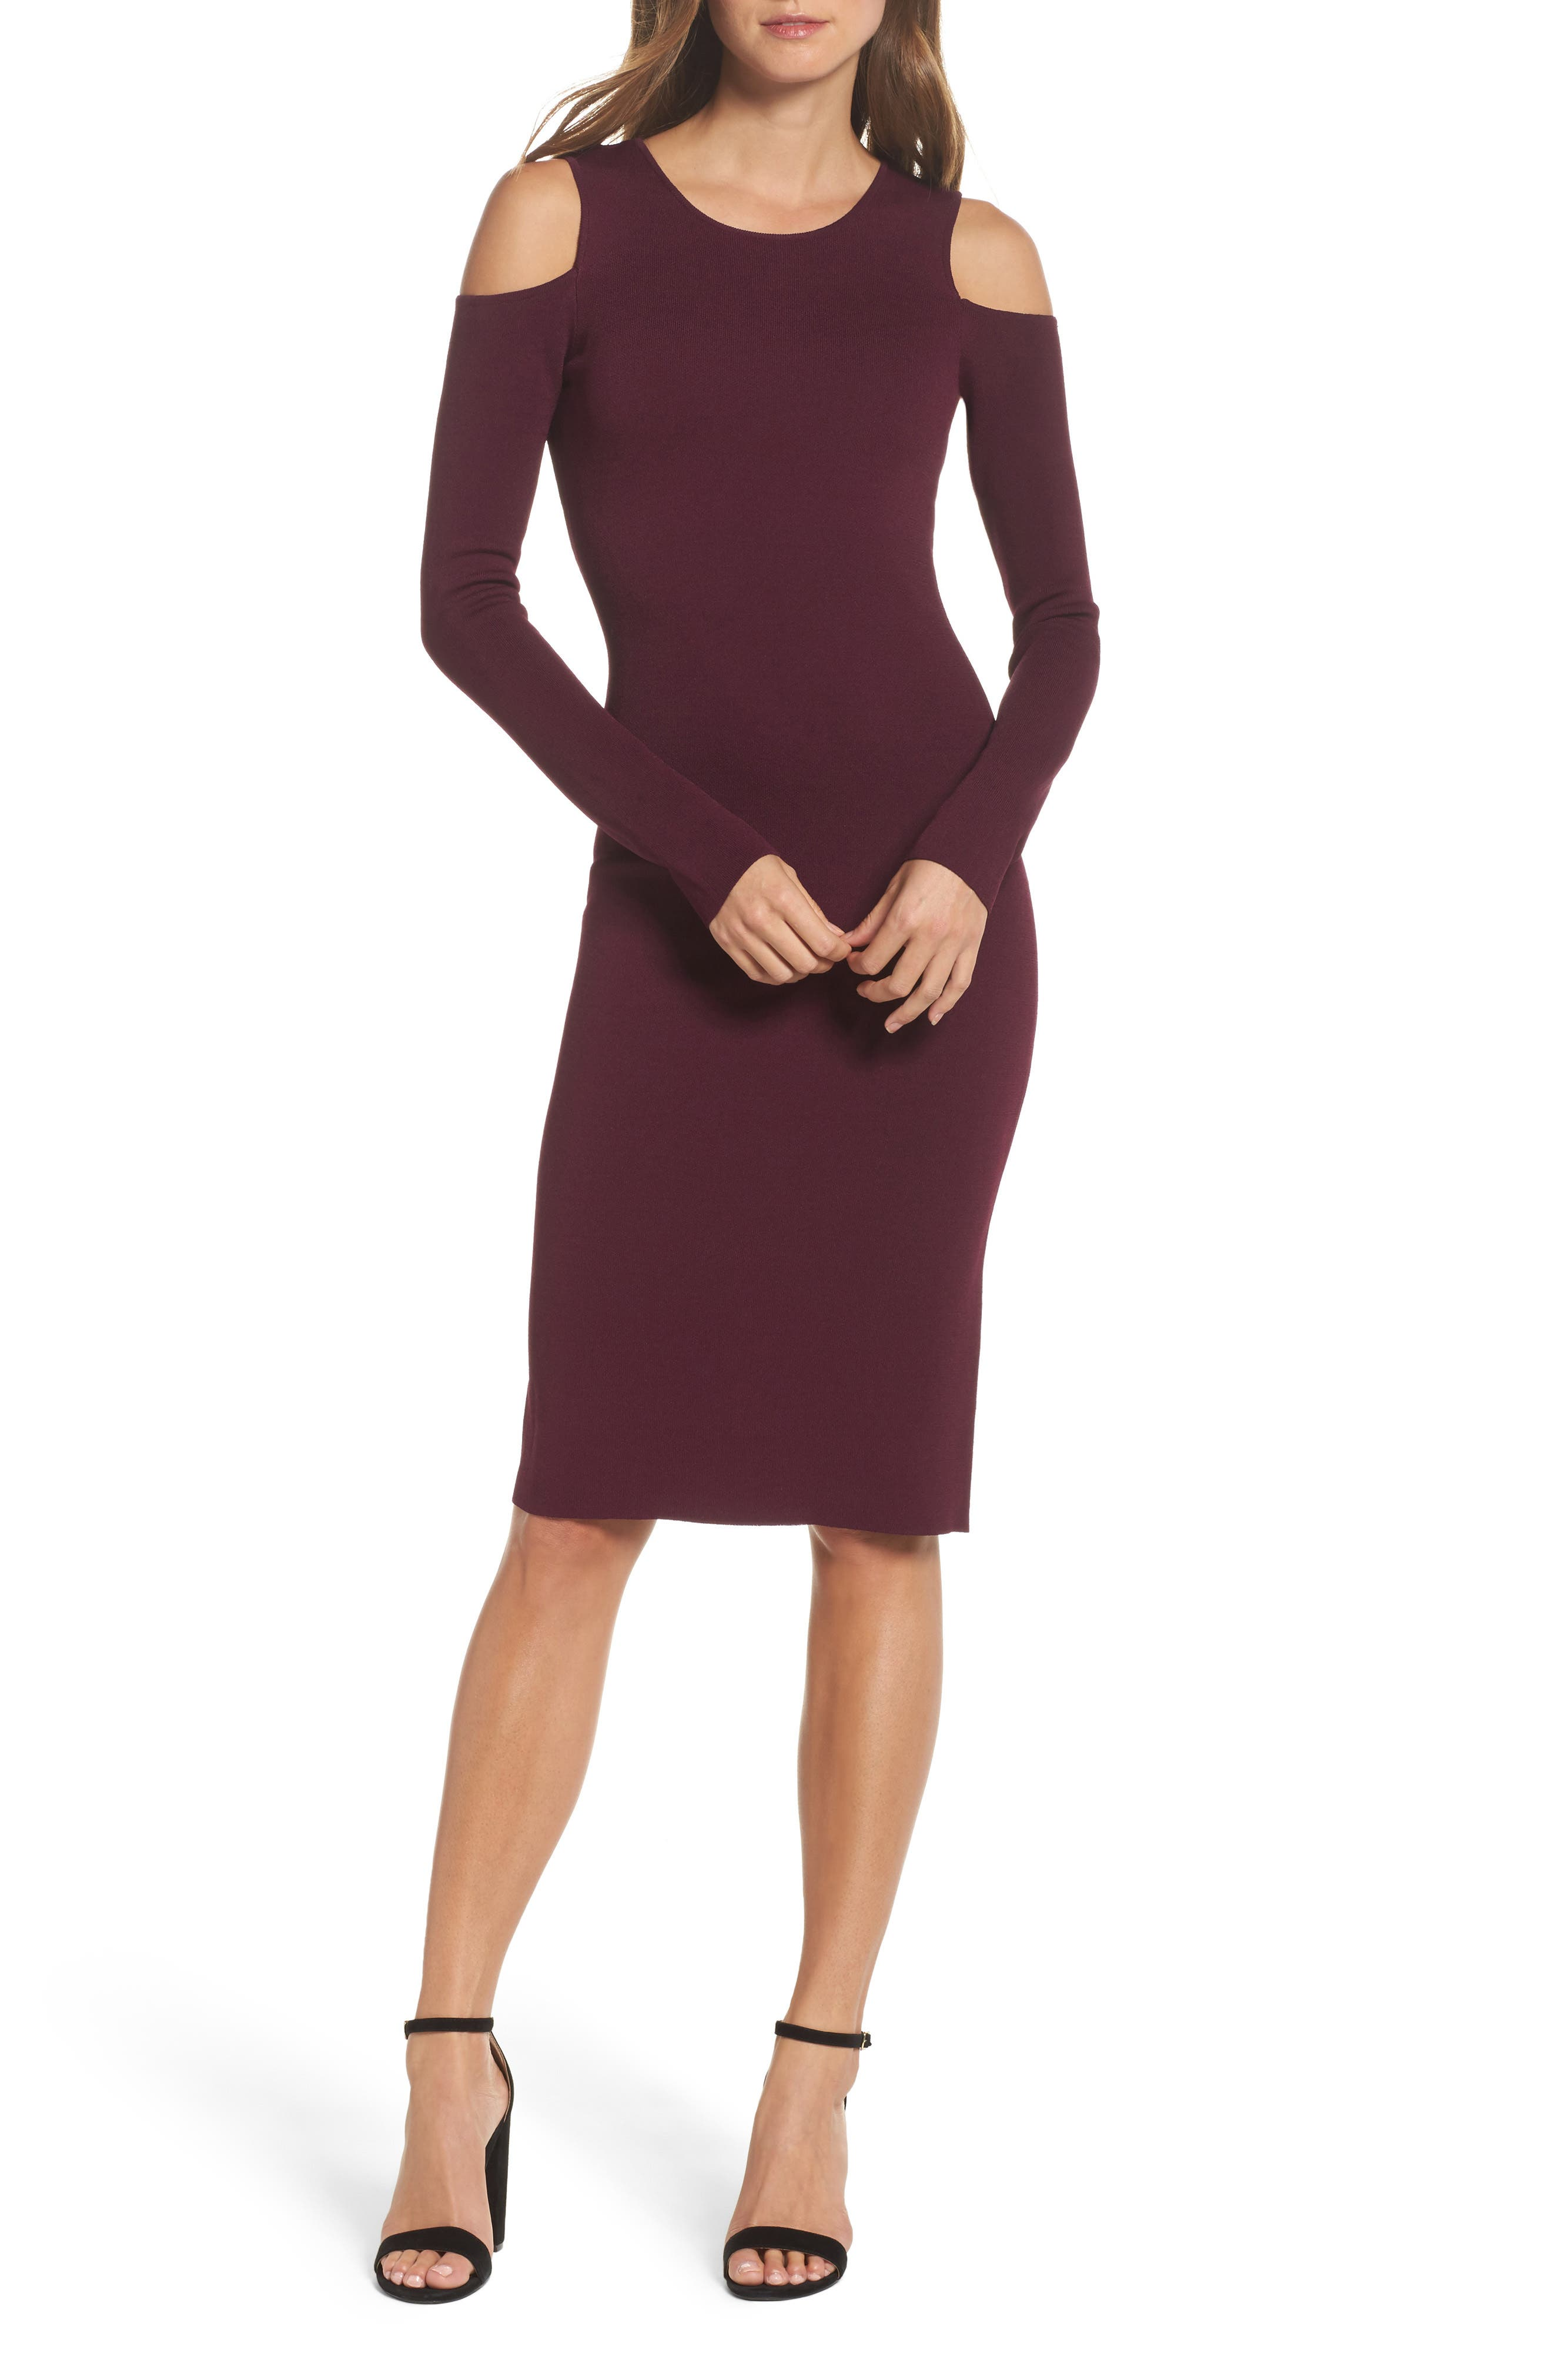 ELIZA J Cold Shoulder Knit Body-Con Dress, Main, color, 500